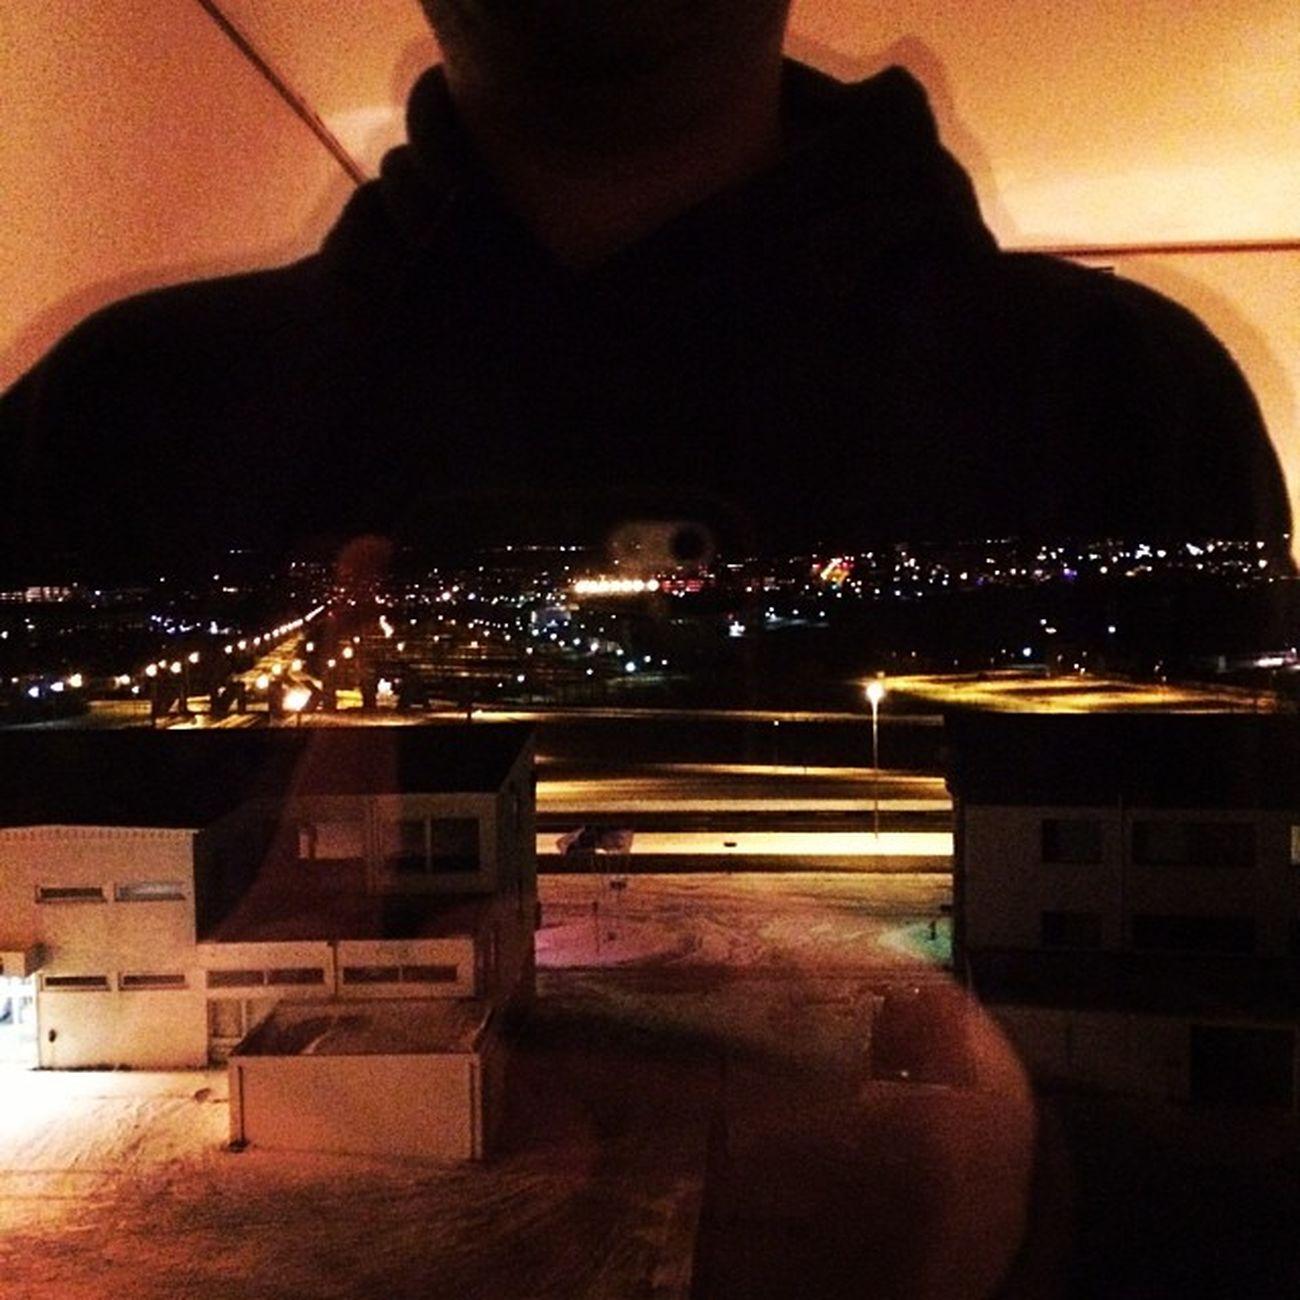 View. #iceland #dark #morning #reykjavik #selfie #now Morning Selfie Now Dark Iceland Reykjavik